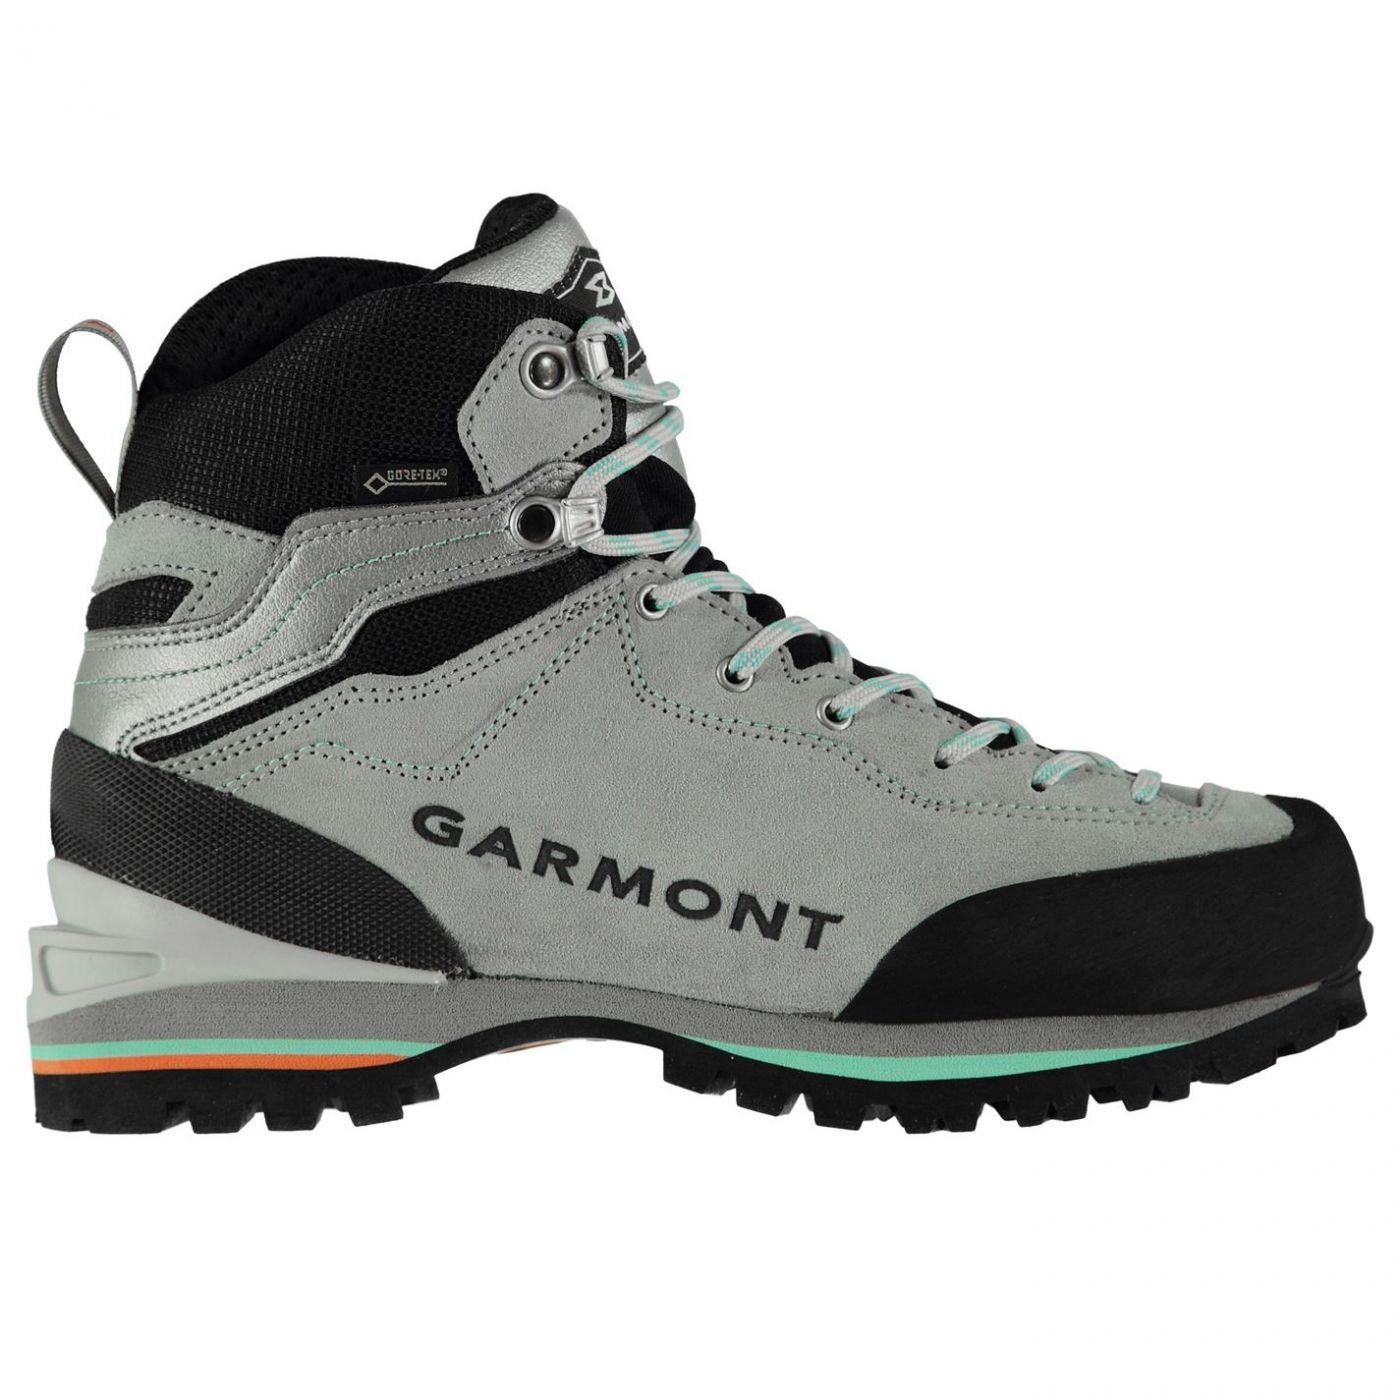 Garmont Ascent GTX Ladies Walking Boots